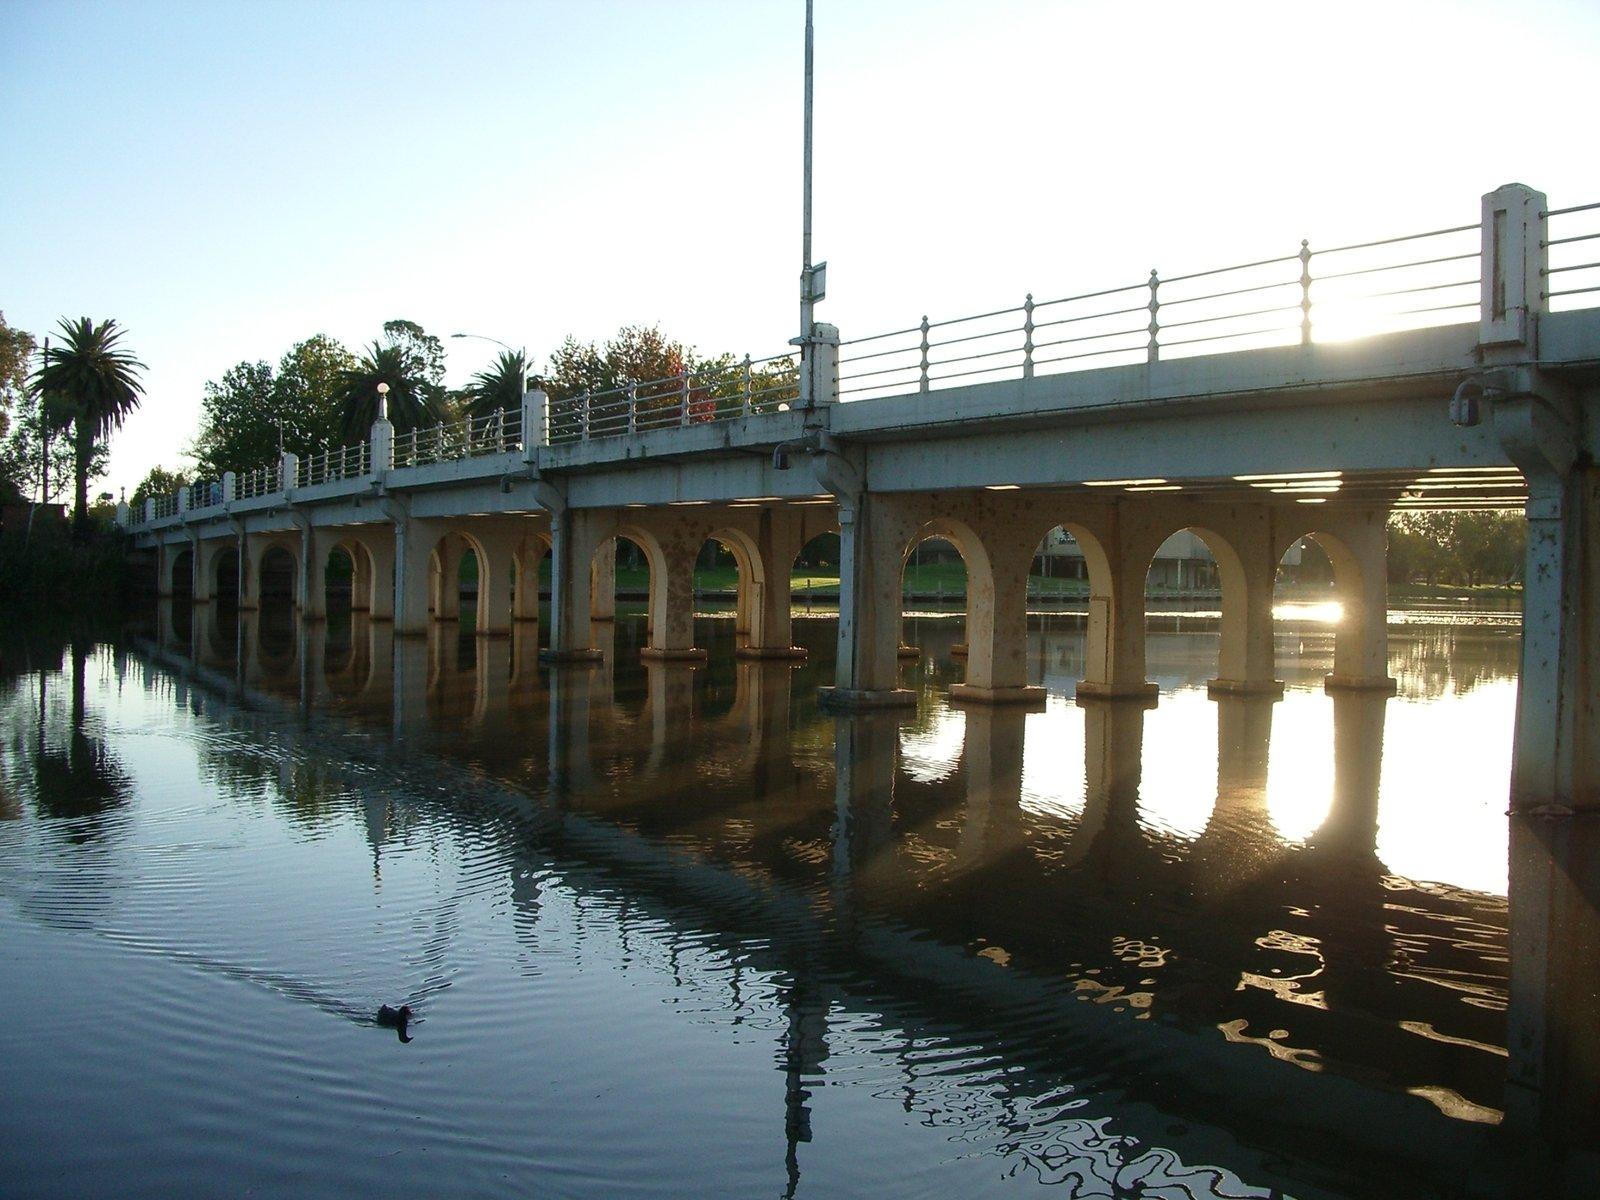 Serenity,bridge,duck,town